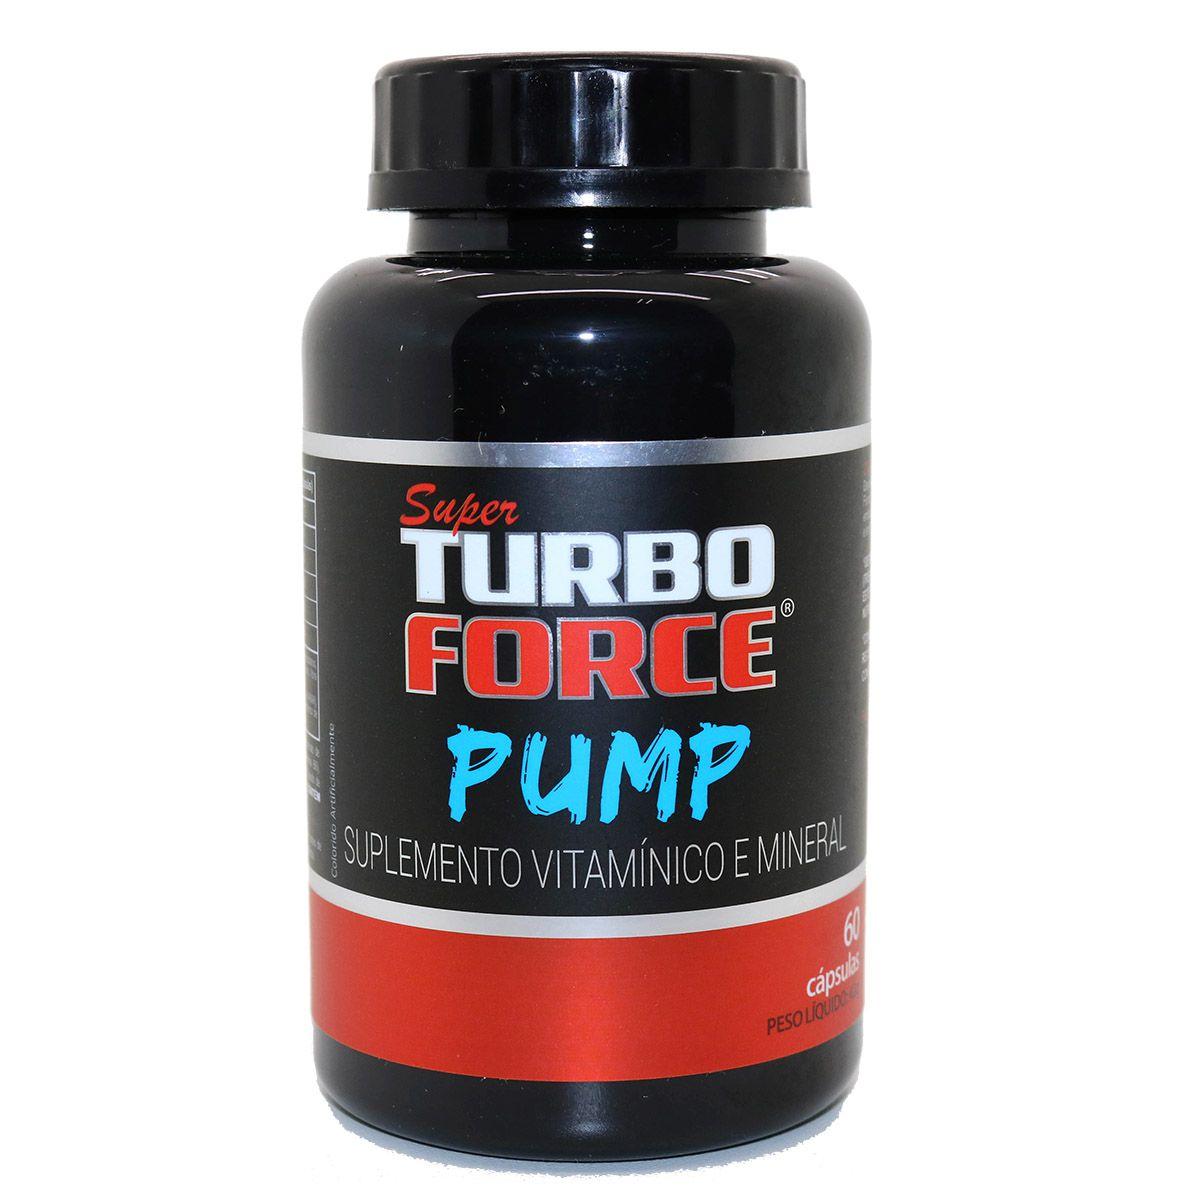 Super Turbo Force - Pump - 60 Cápsulas - Intlab